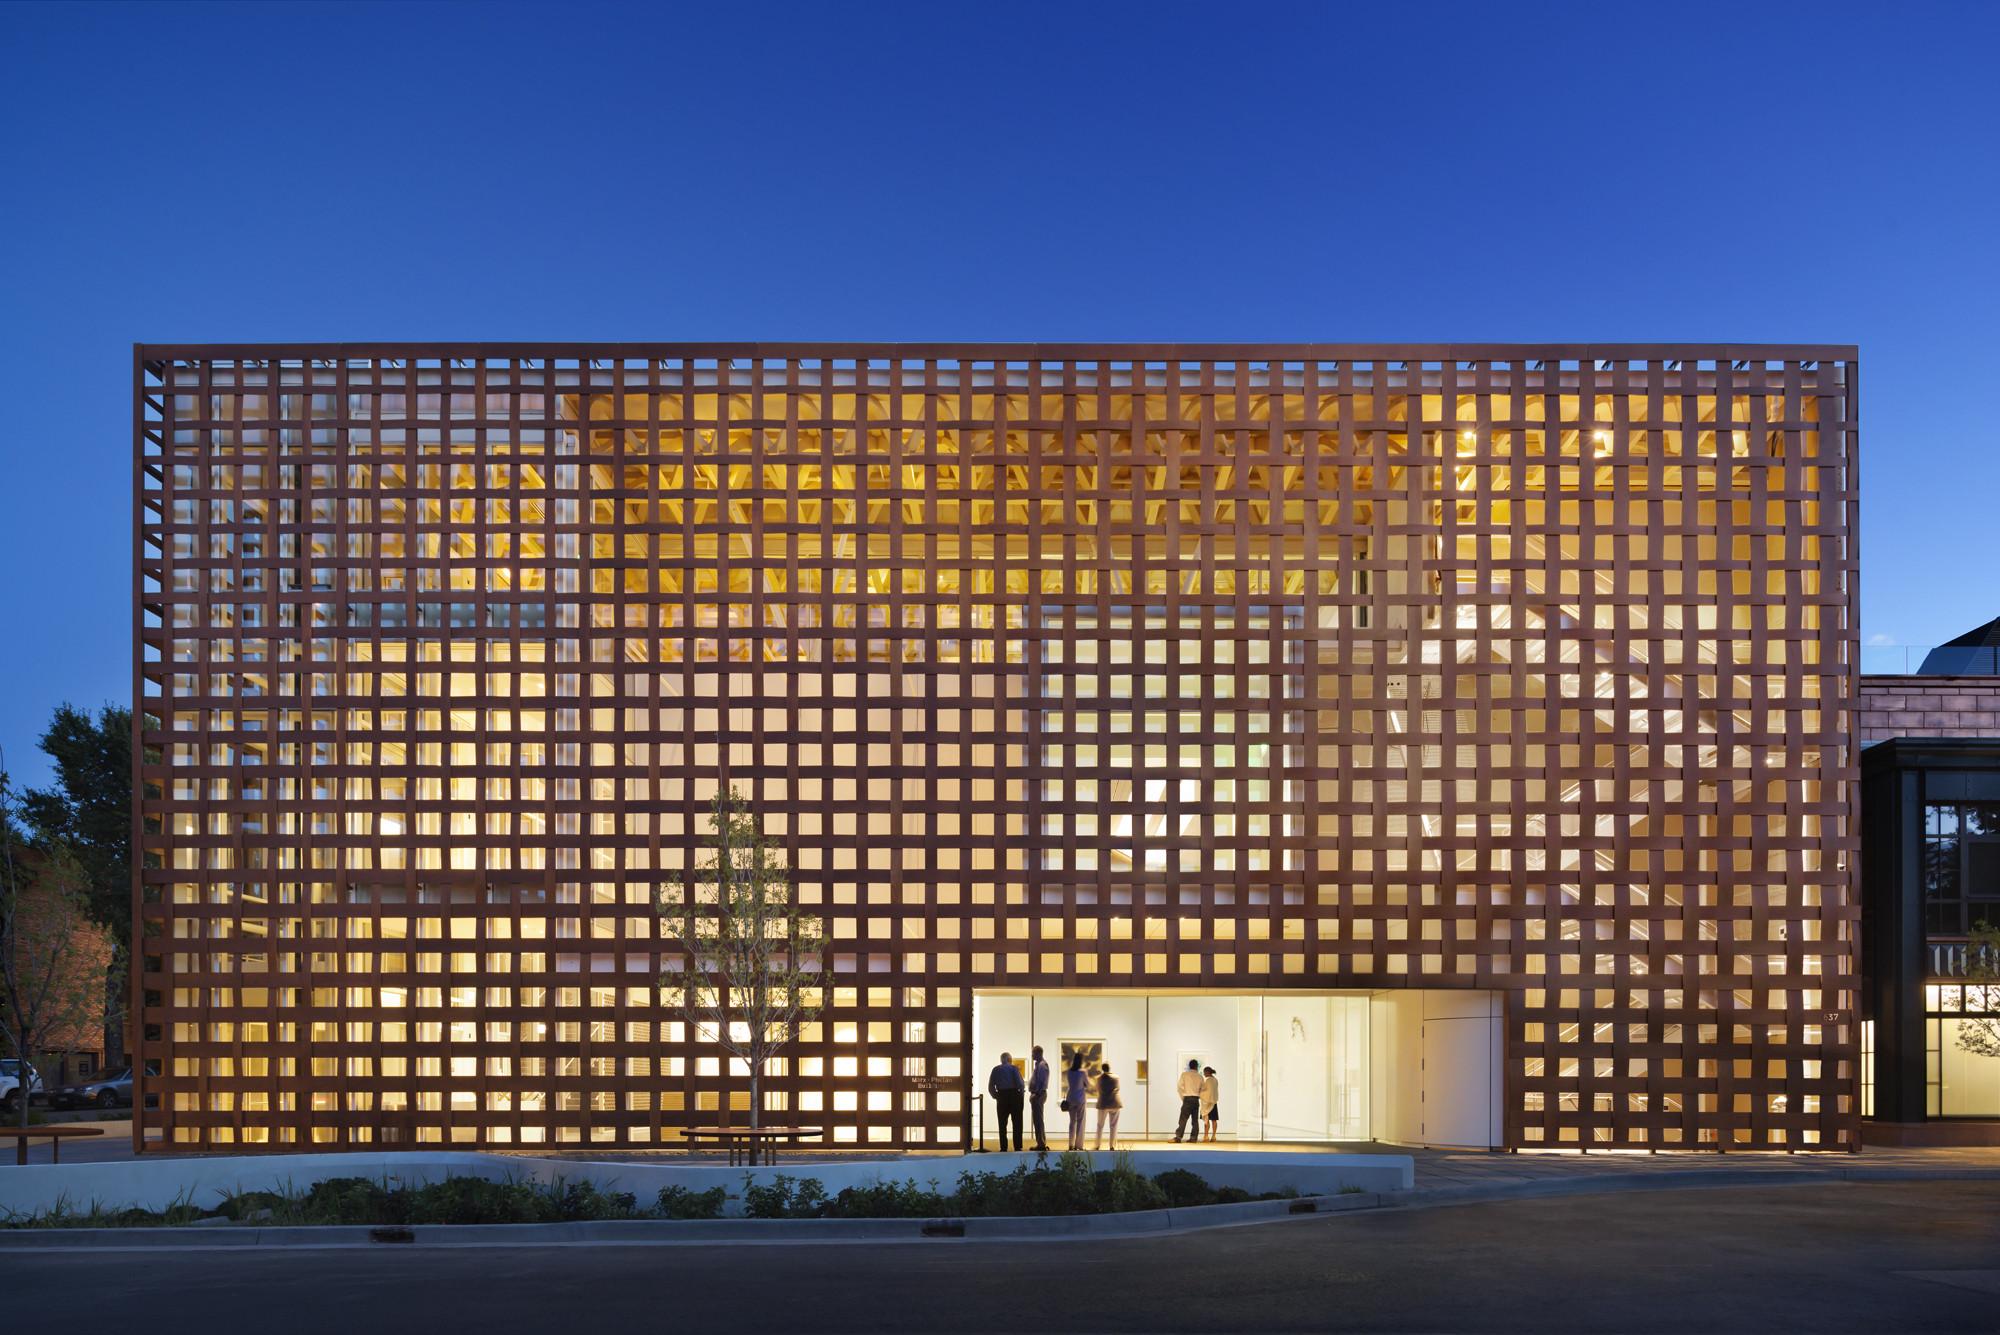 Aspen Art Museum (Aspen, CO) Shigeru Ban Architects. Image © Michael Moran/OTTO